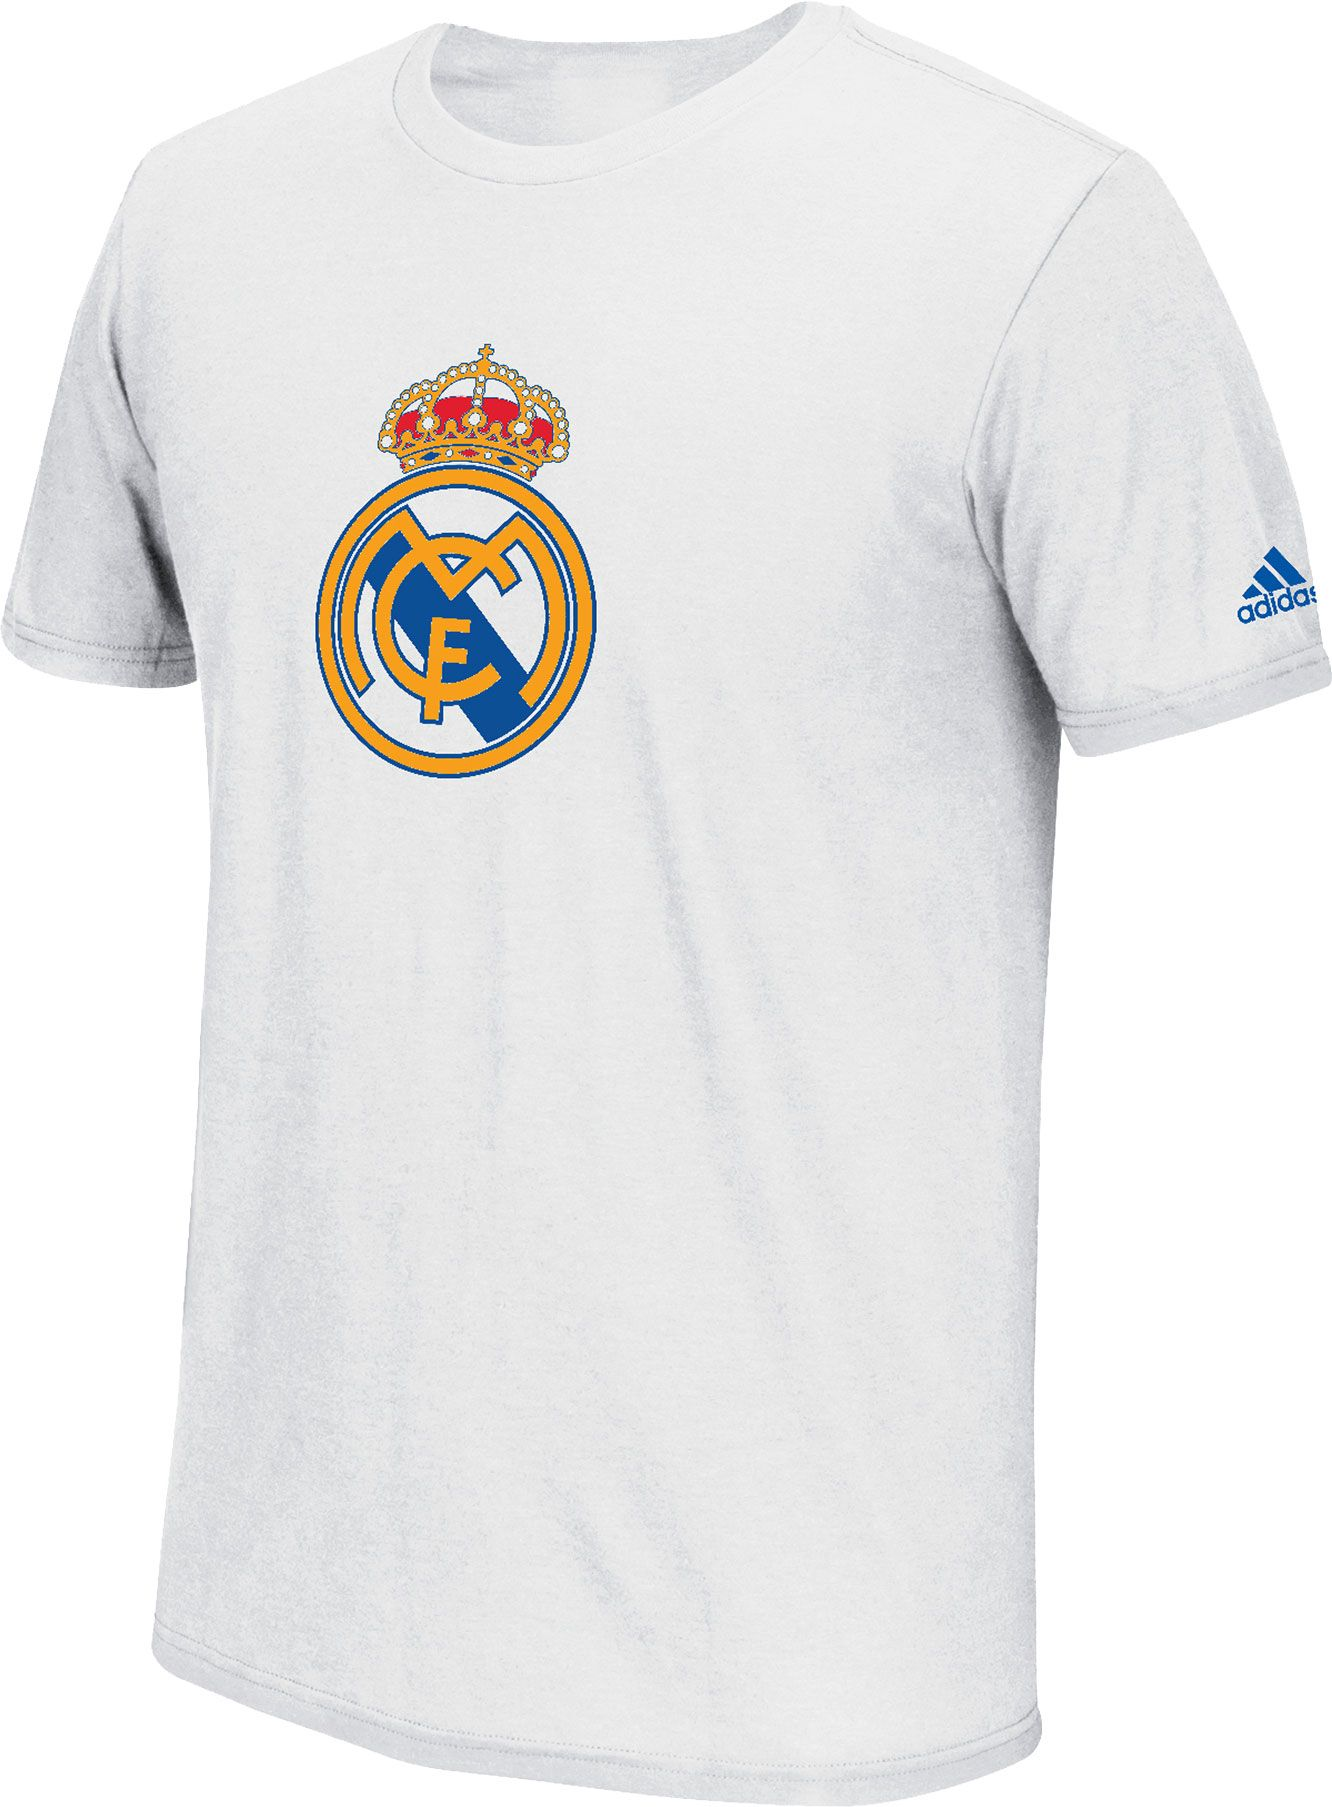 T shirt adidas white - Noimagefound